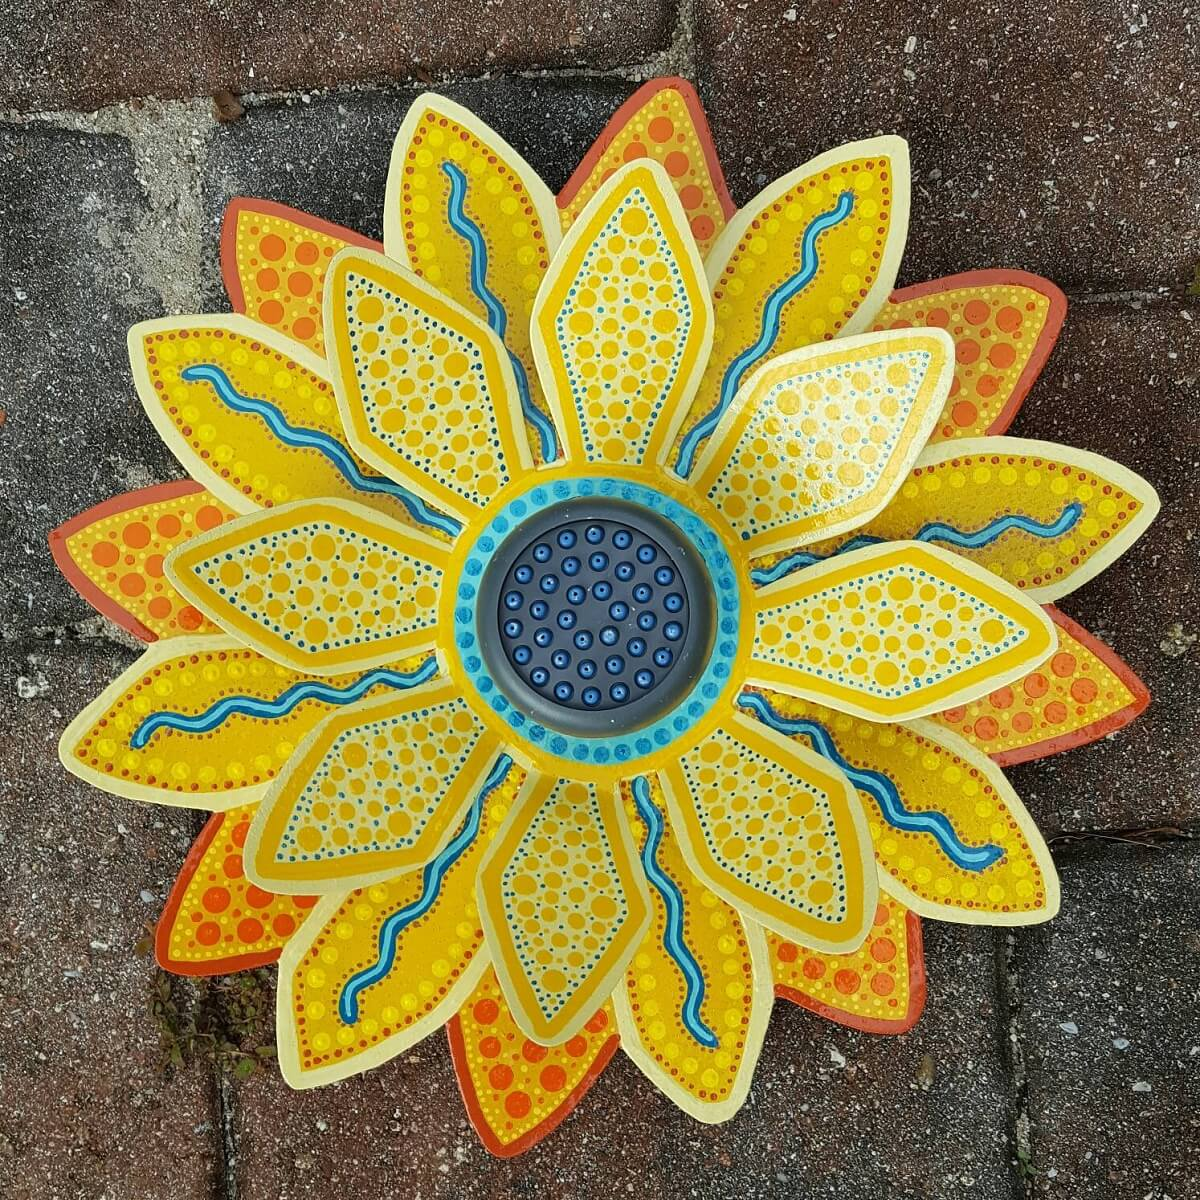 Outdoor Sunflower Shower Head